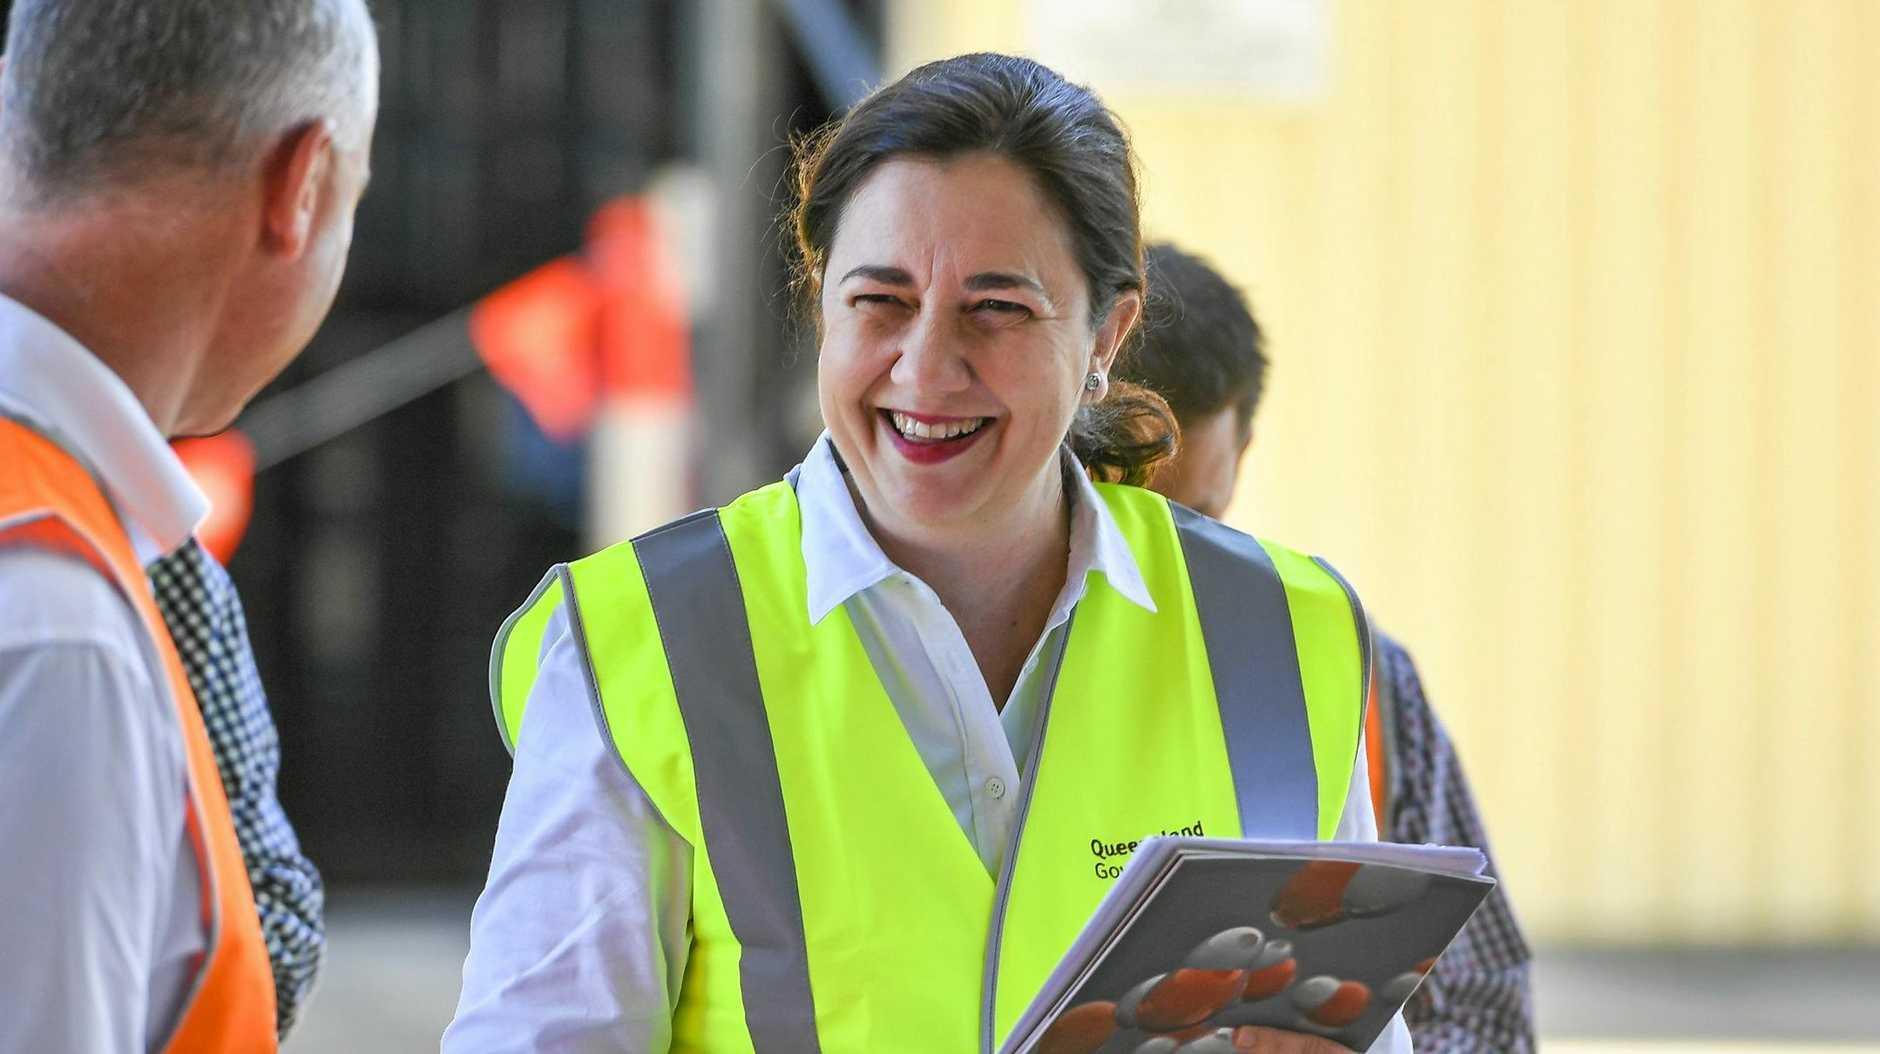 Queensland Premier Annastacia Palaszczuk will be in Rockhampton today.